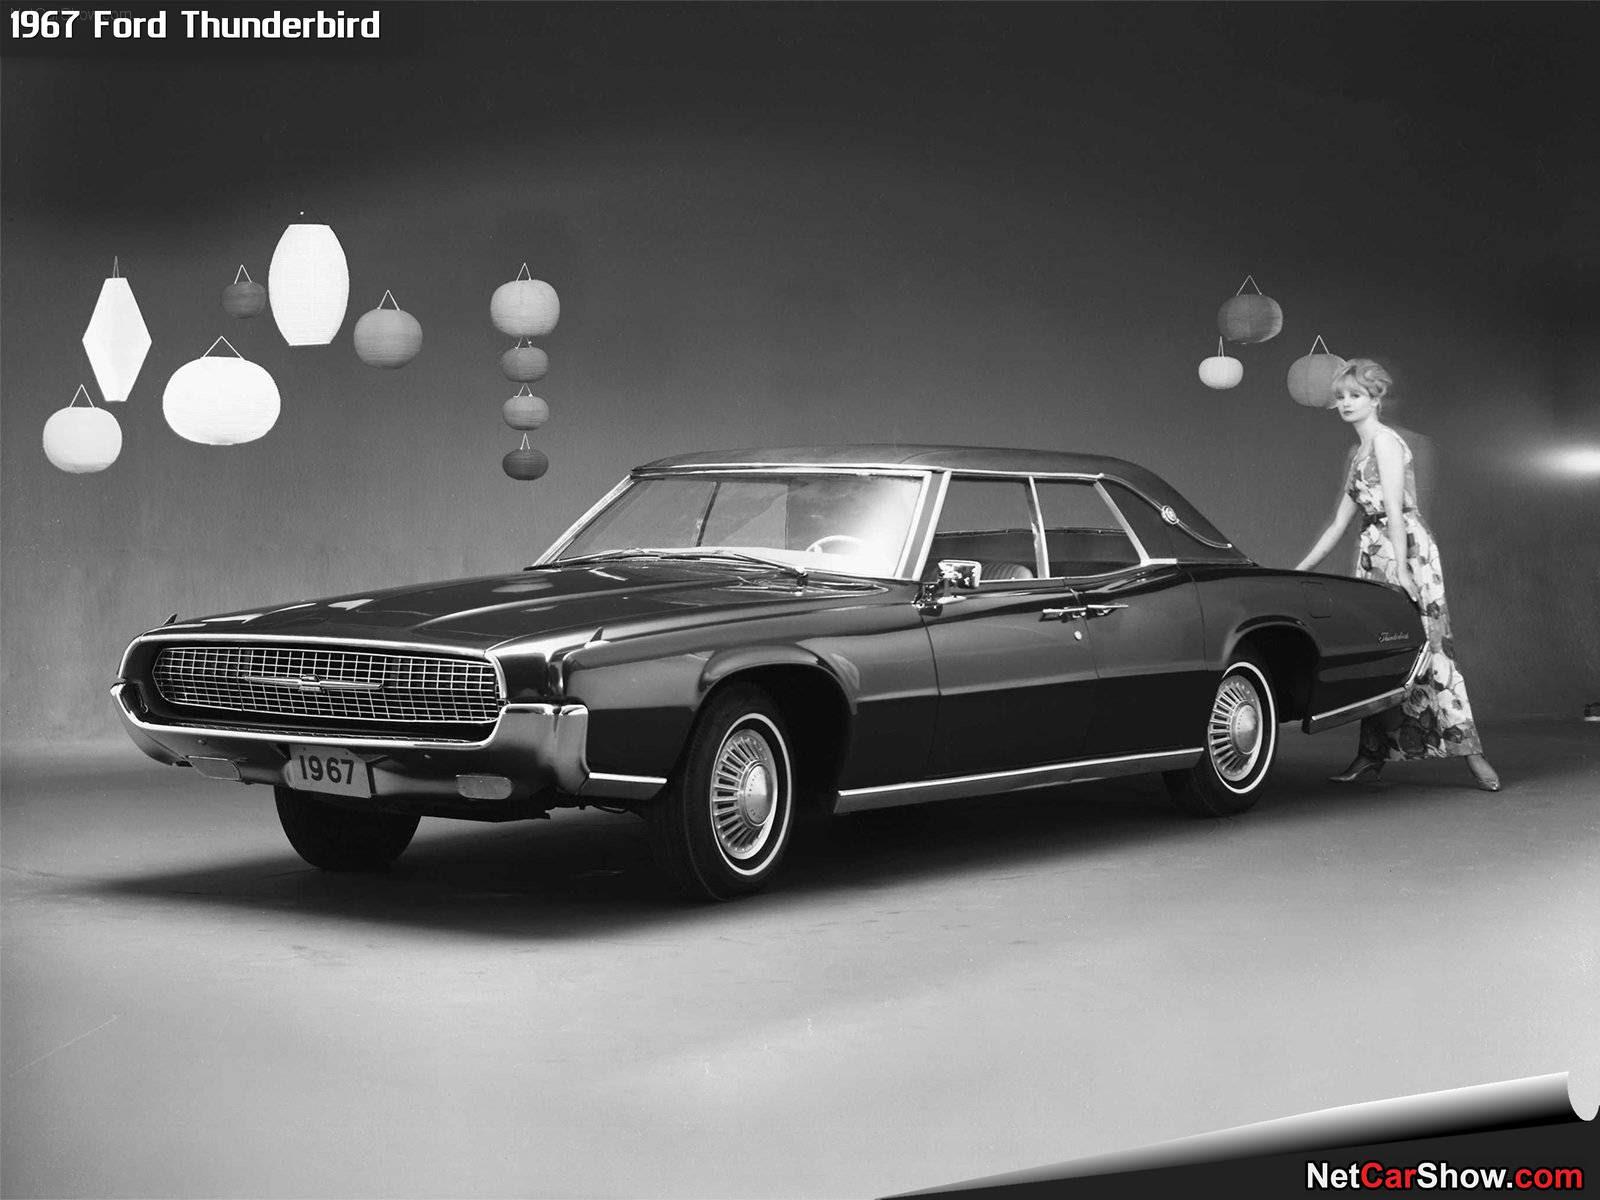 Ford Thunderbird (1967)